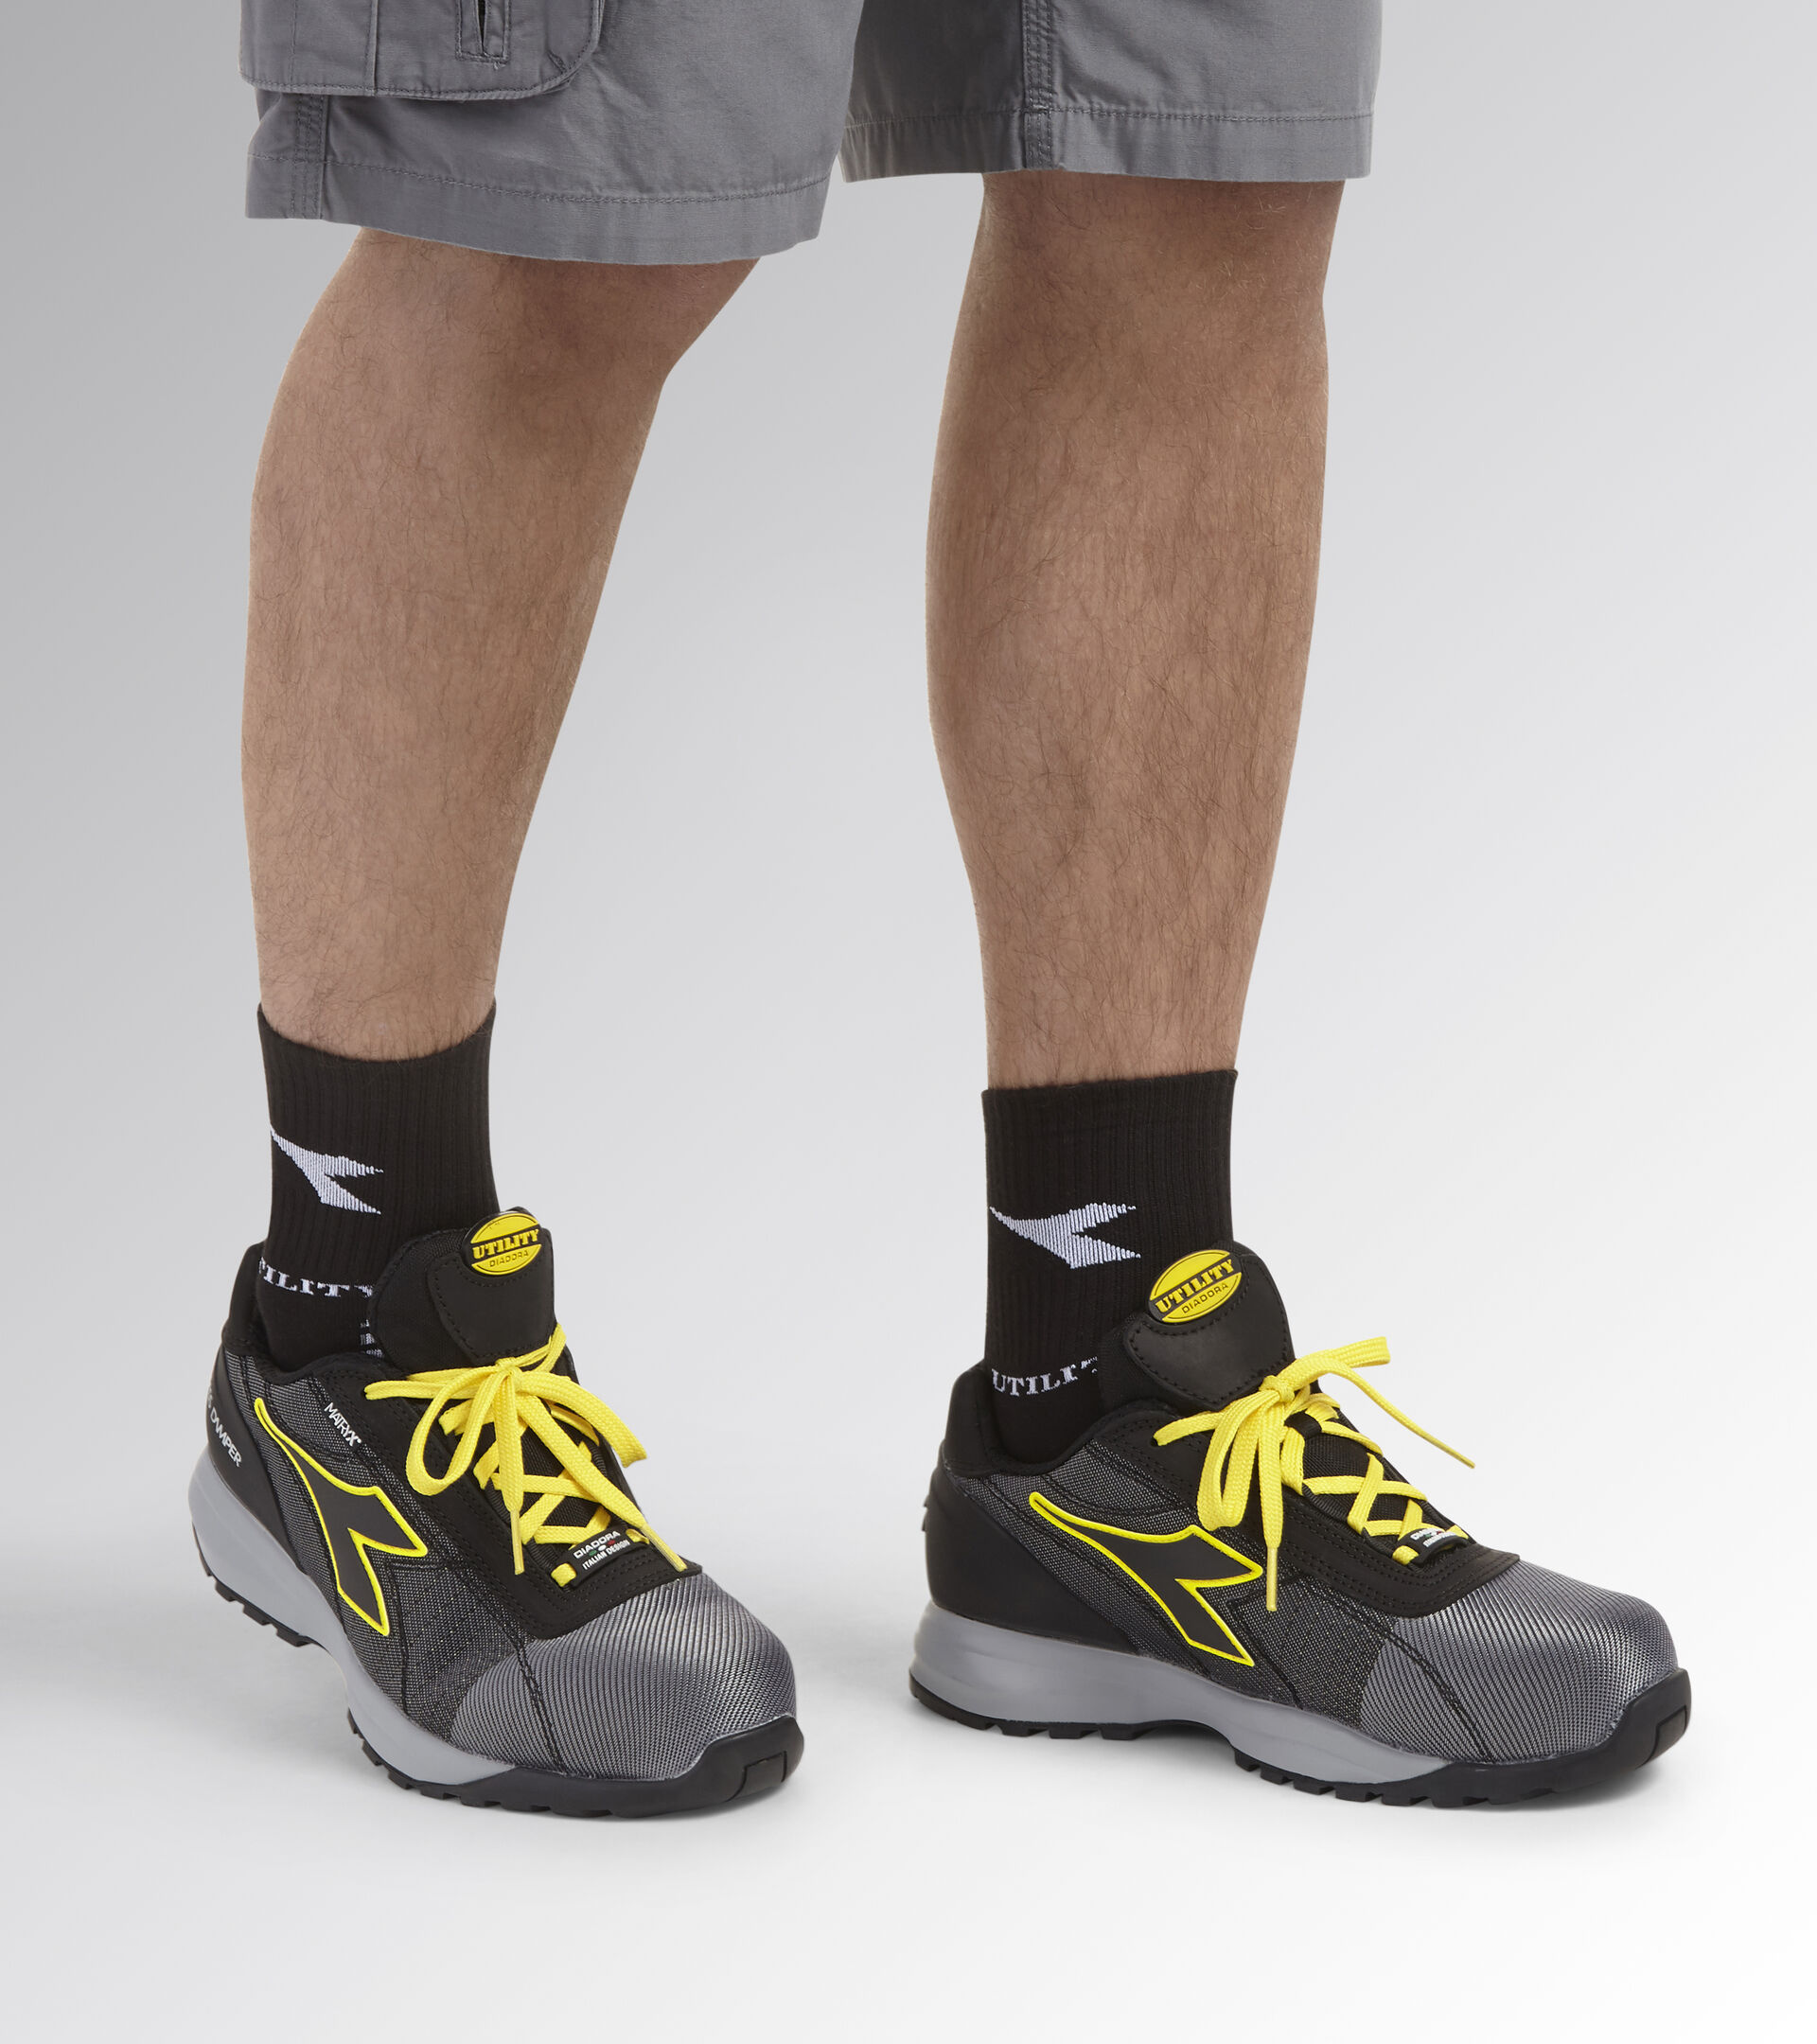 Footwear Utility UNISEX GLOVE MDS MATRYX LOW S3 HRO SRC GRAY/BLACK (C2539) Utility